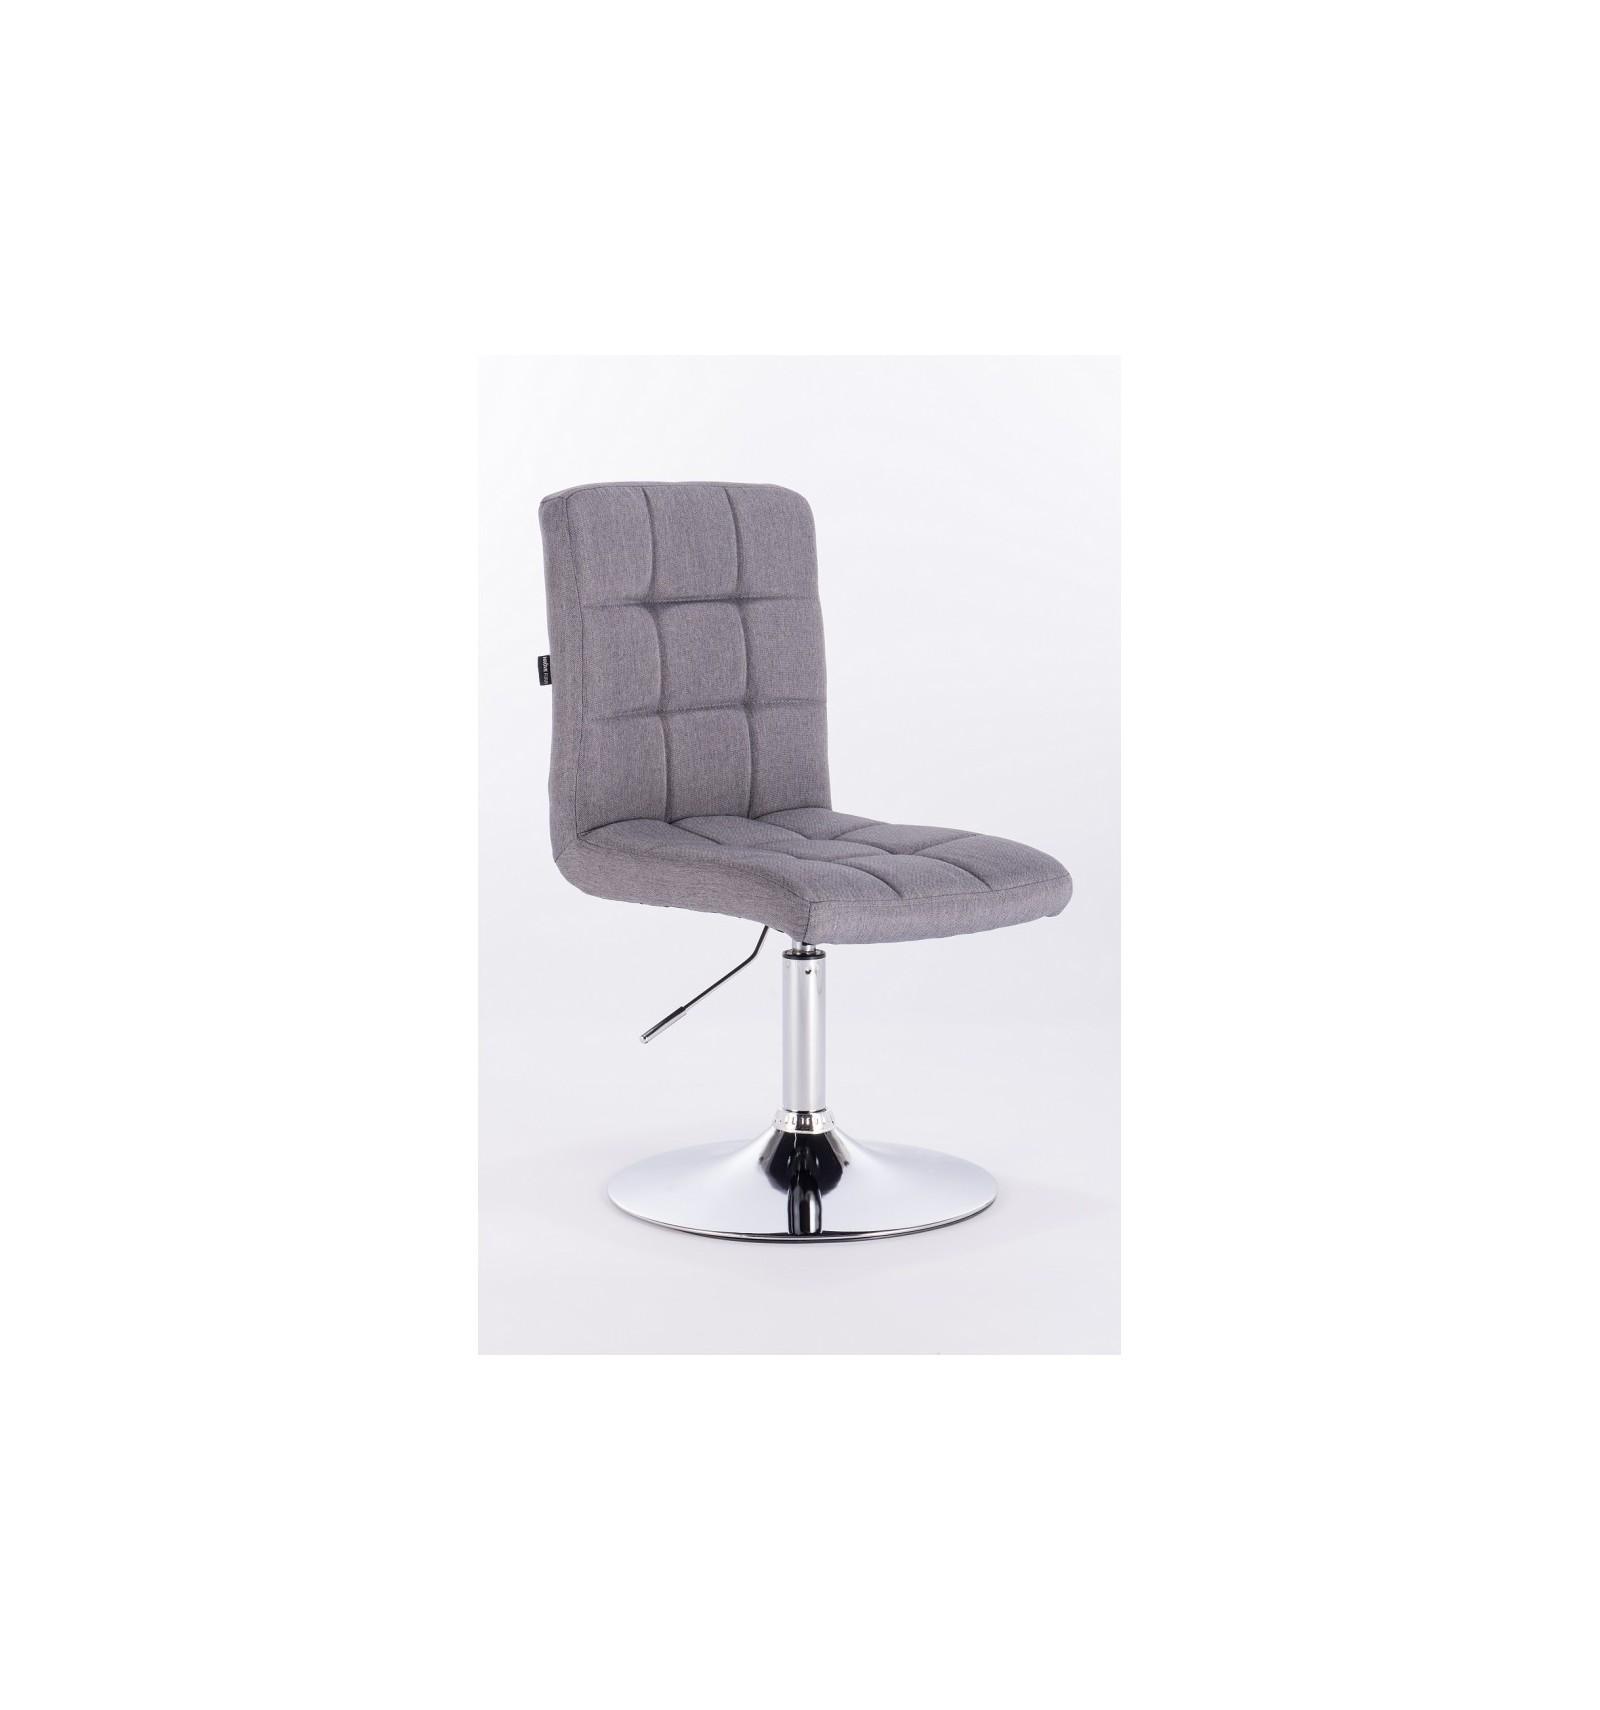 Hroove Salon Chair   Grey Tweed Bella Furniture Ireland BFHR7009N